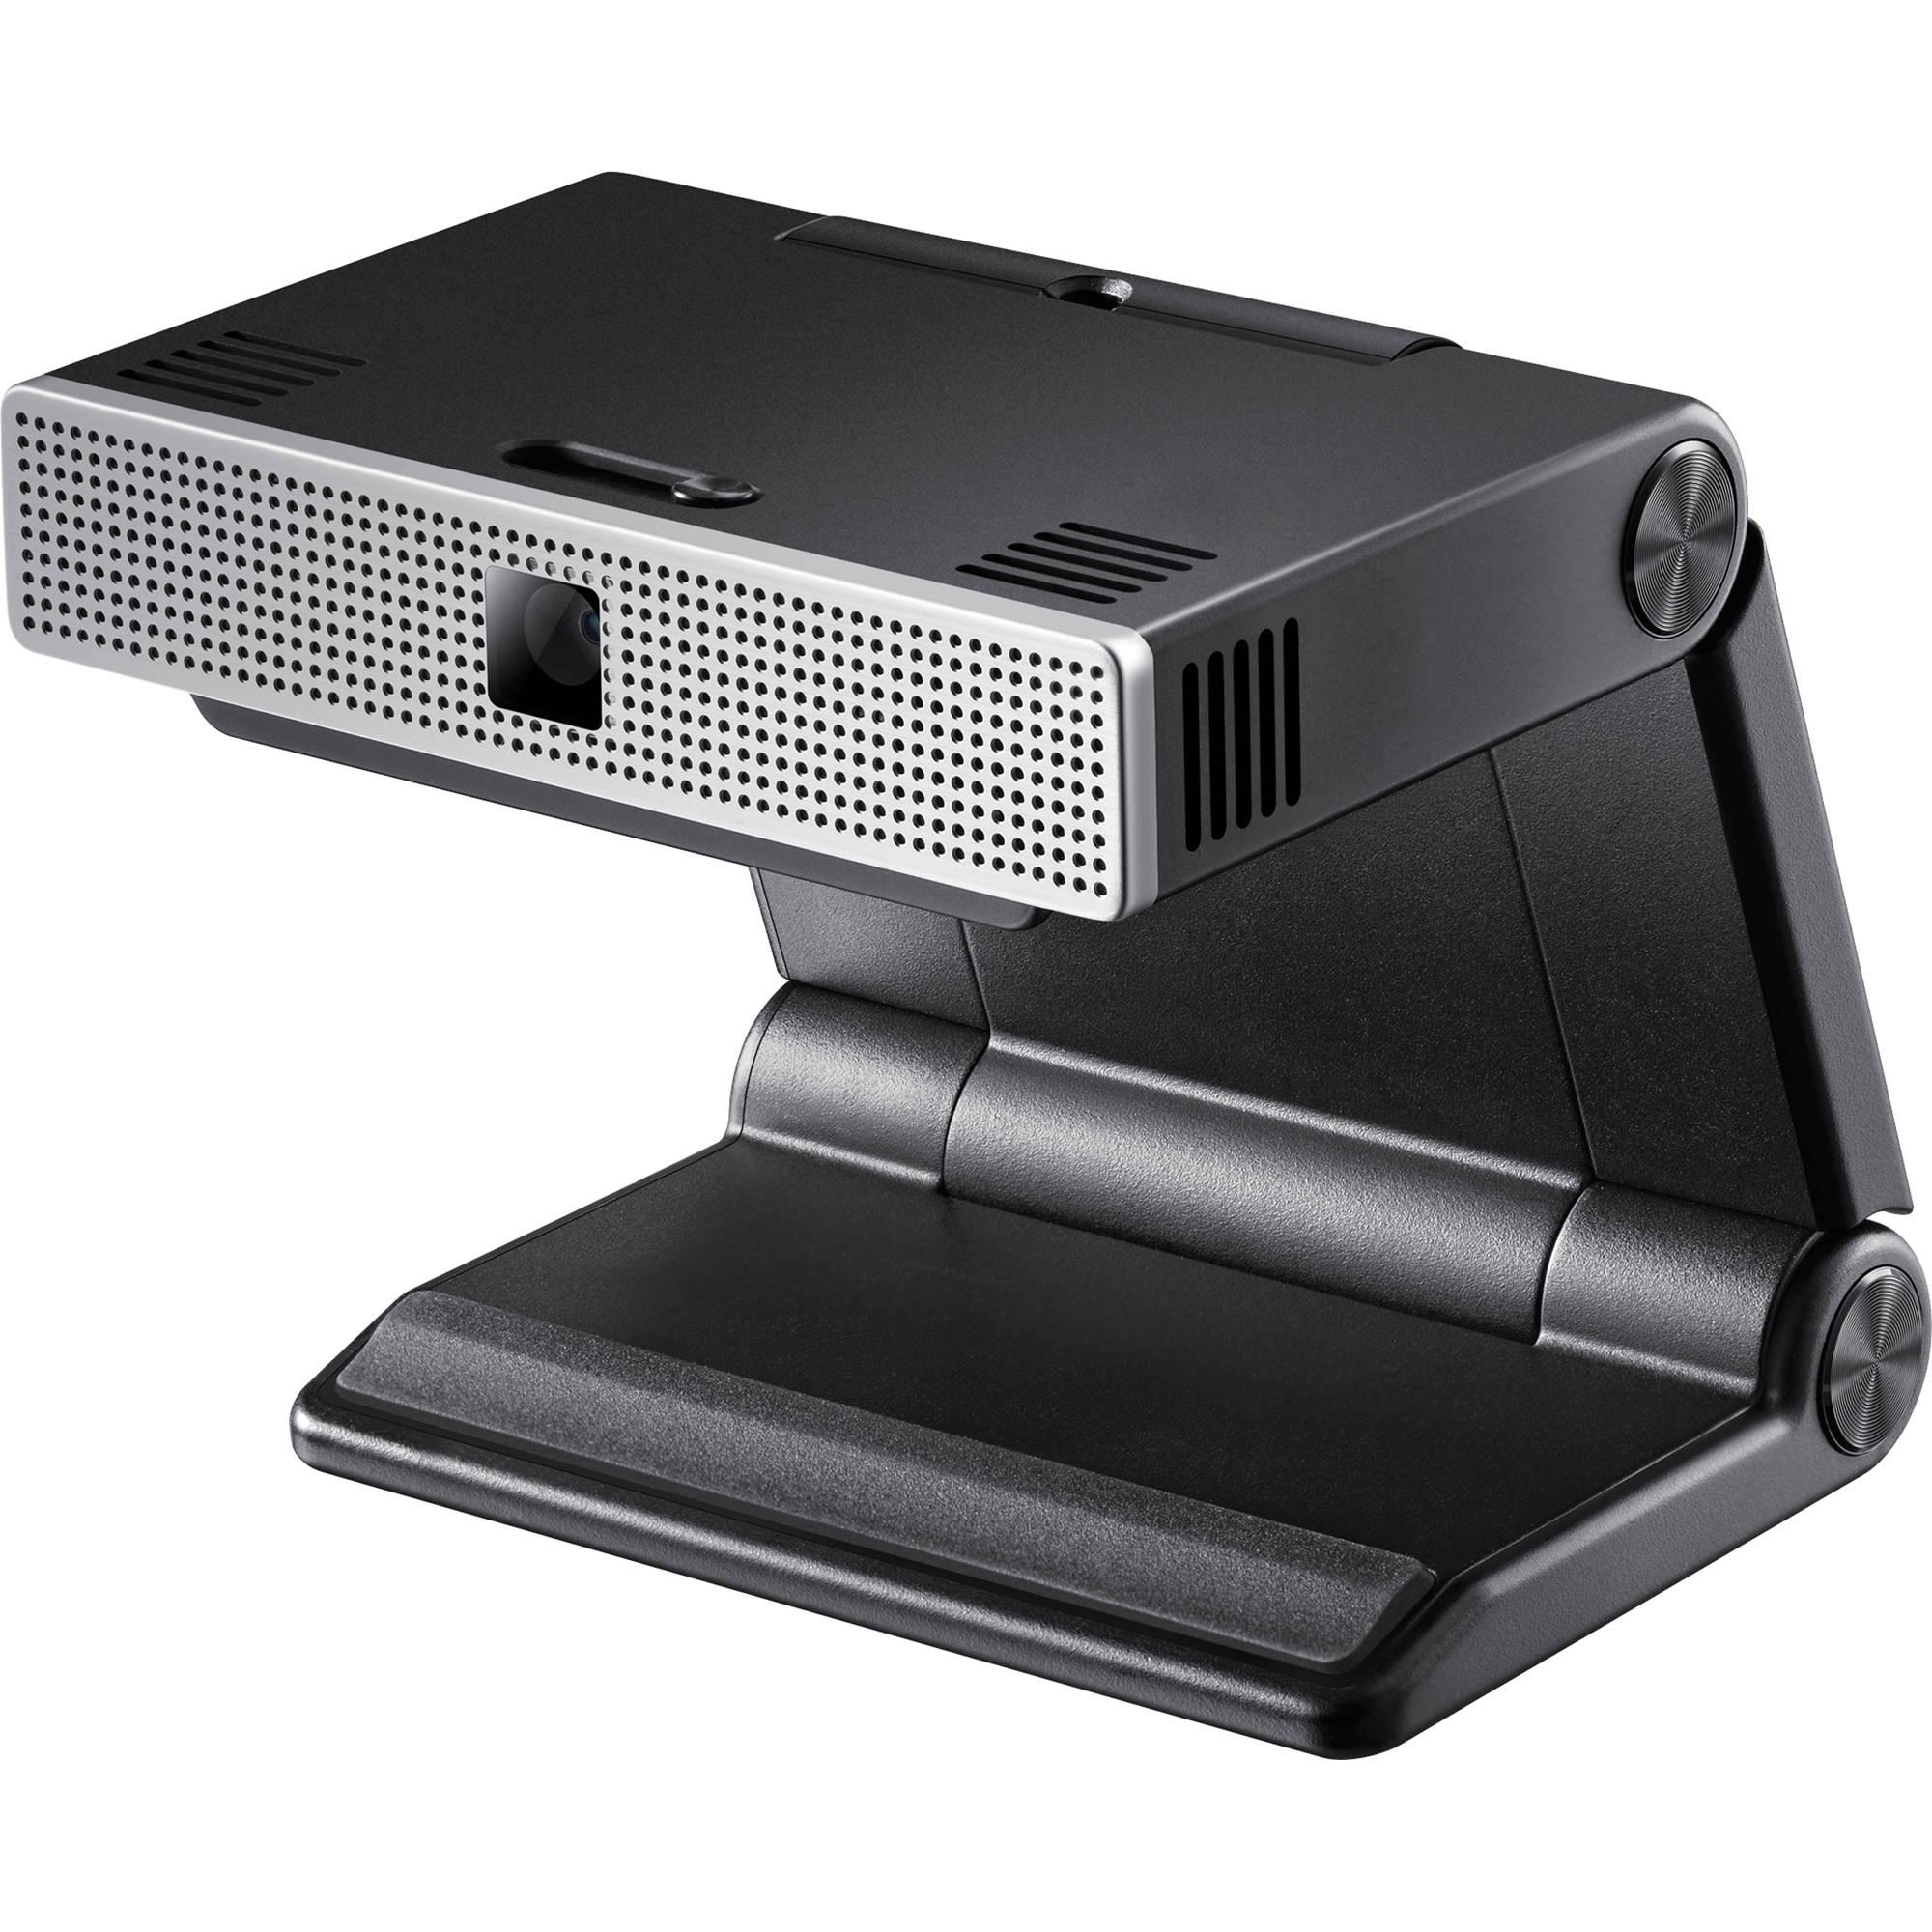 Samsung TV Camera for 2012 and 2013 Samsung Smart TVs